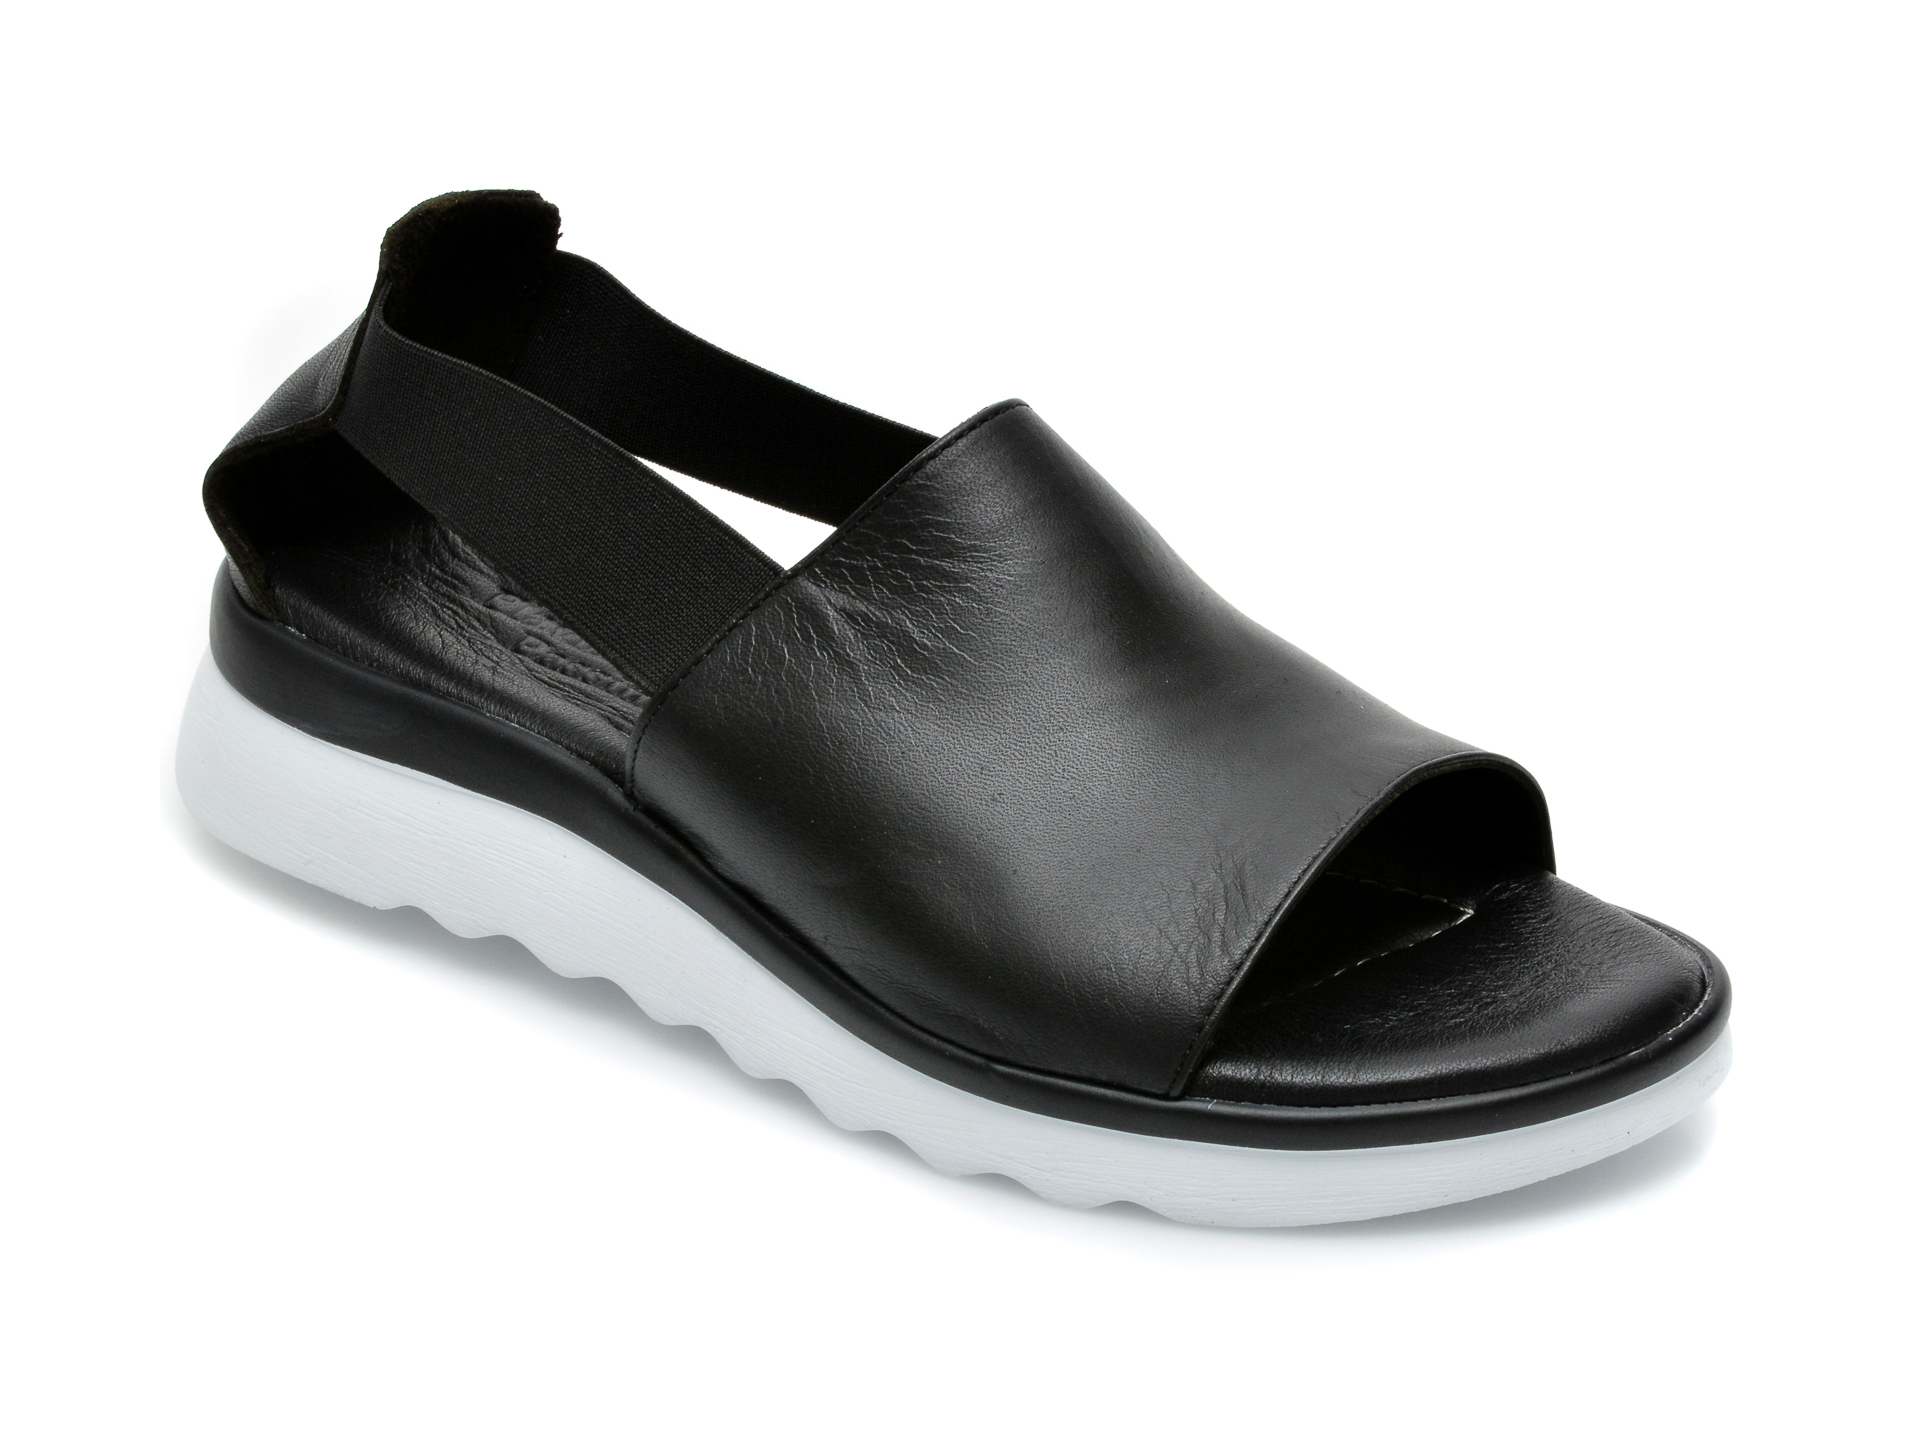 Sandale FLAVIA PASSINI negre, EI24501, din piele naturala imagine otter.ro 2021